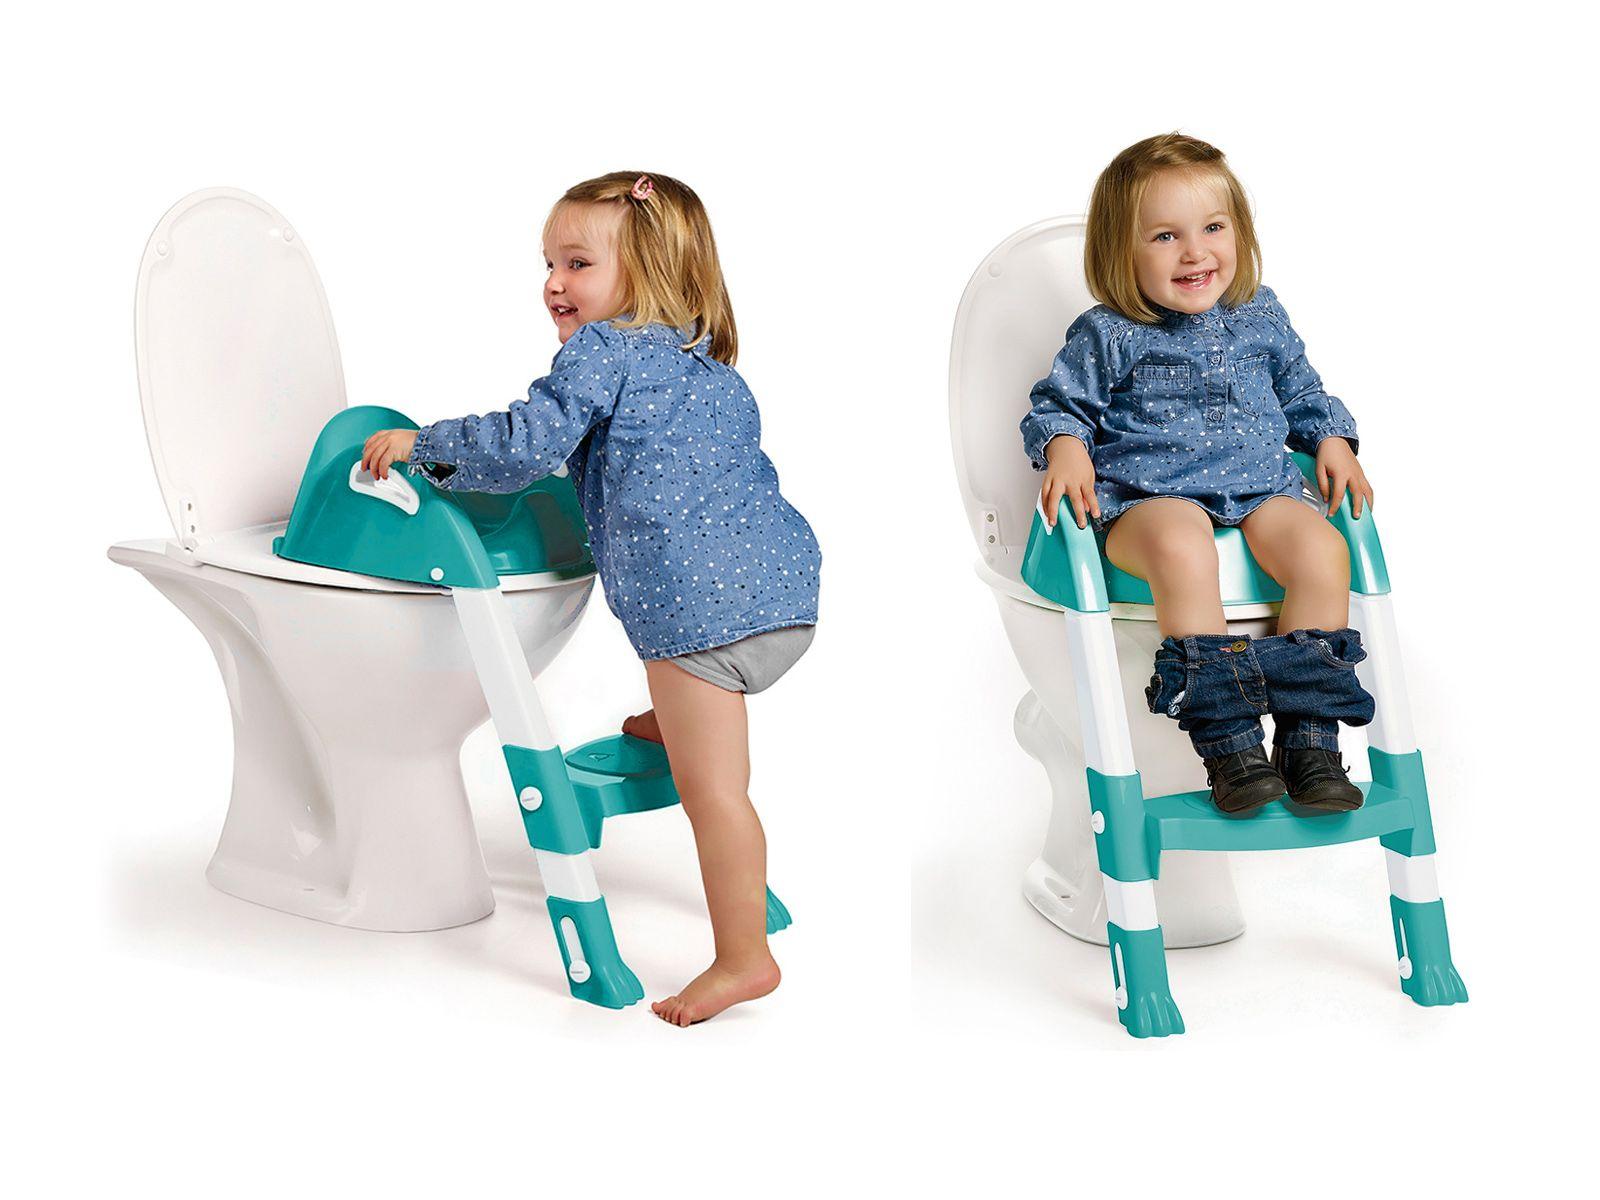 Thermobaby Nakladka Wc Sedes Toalete Ze Stopniem 5528822008 Oficjalne Archiwum Allegro High Chair Home Decor Decor